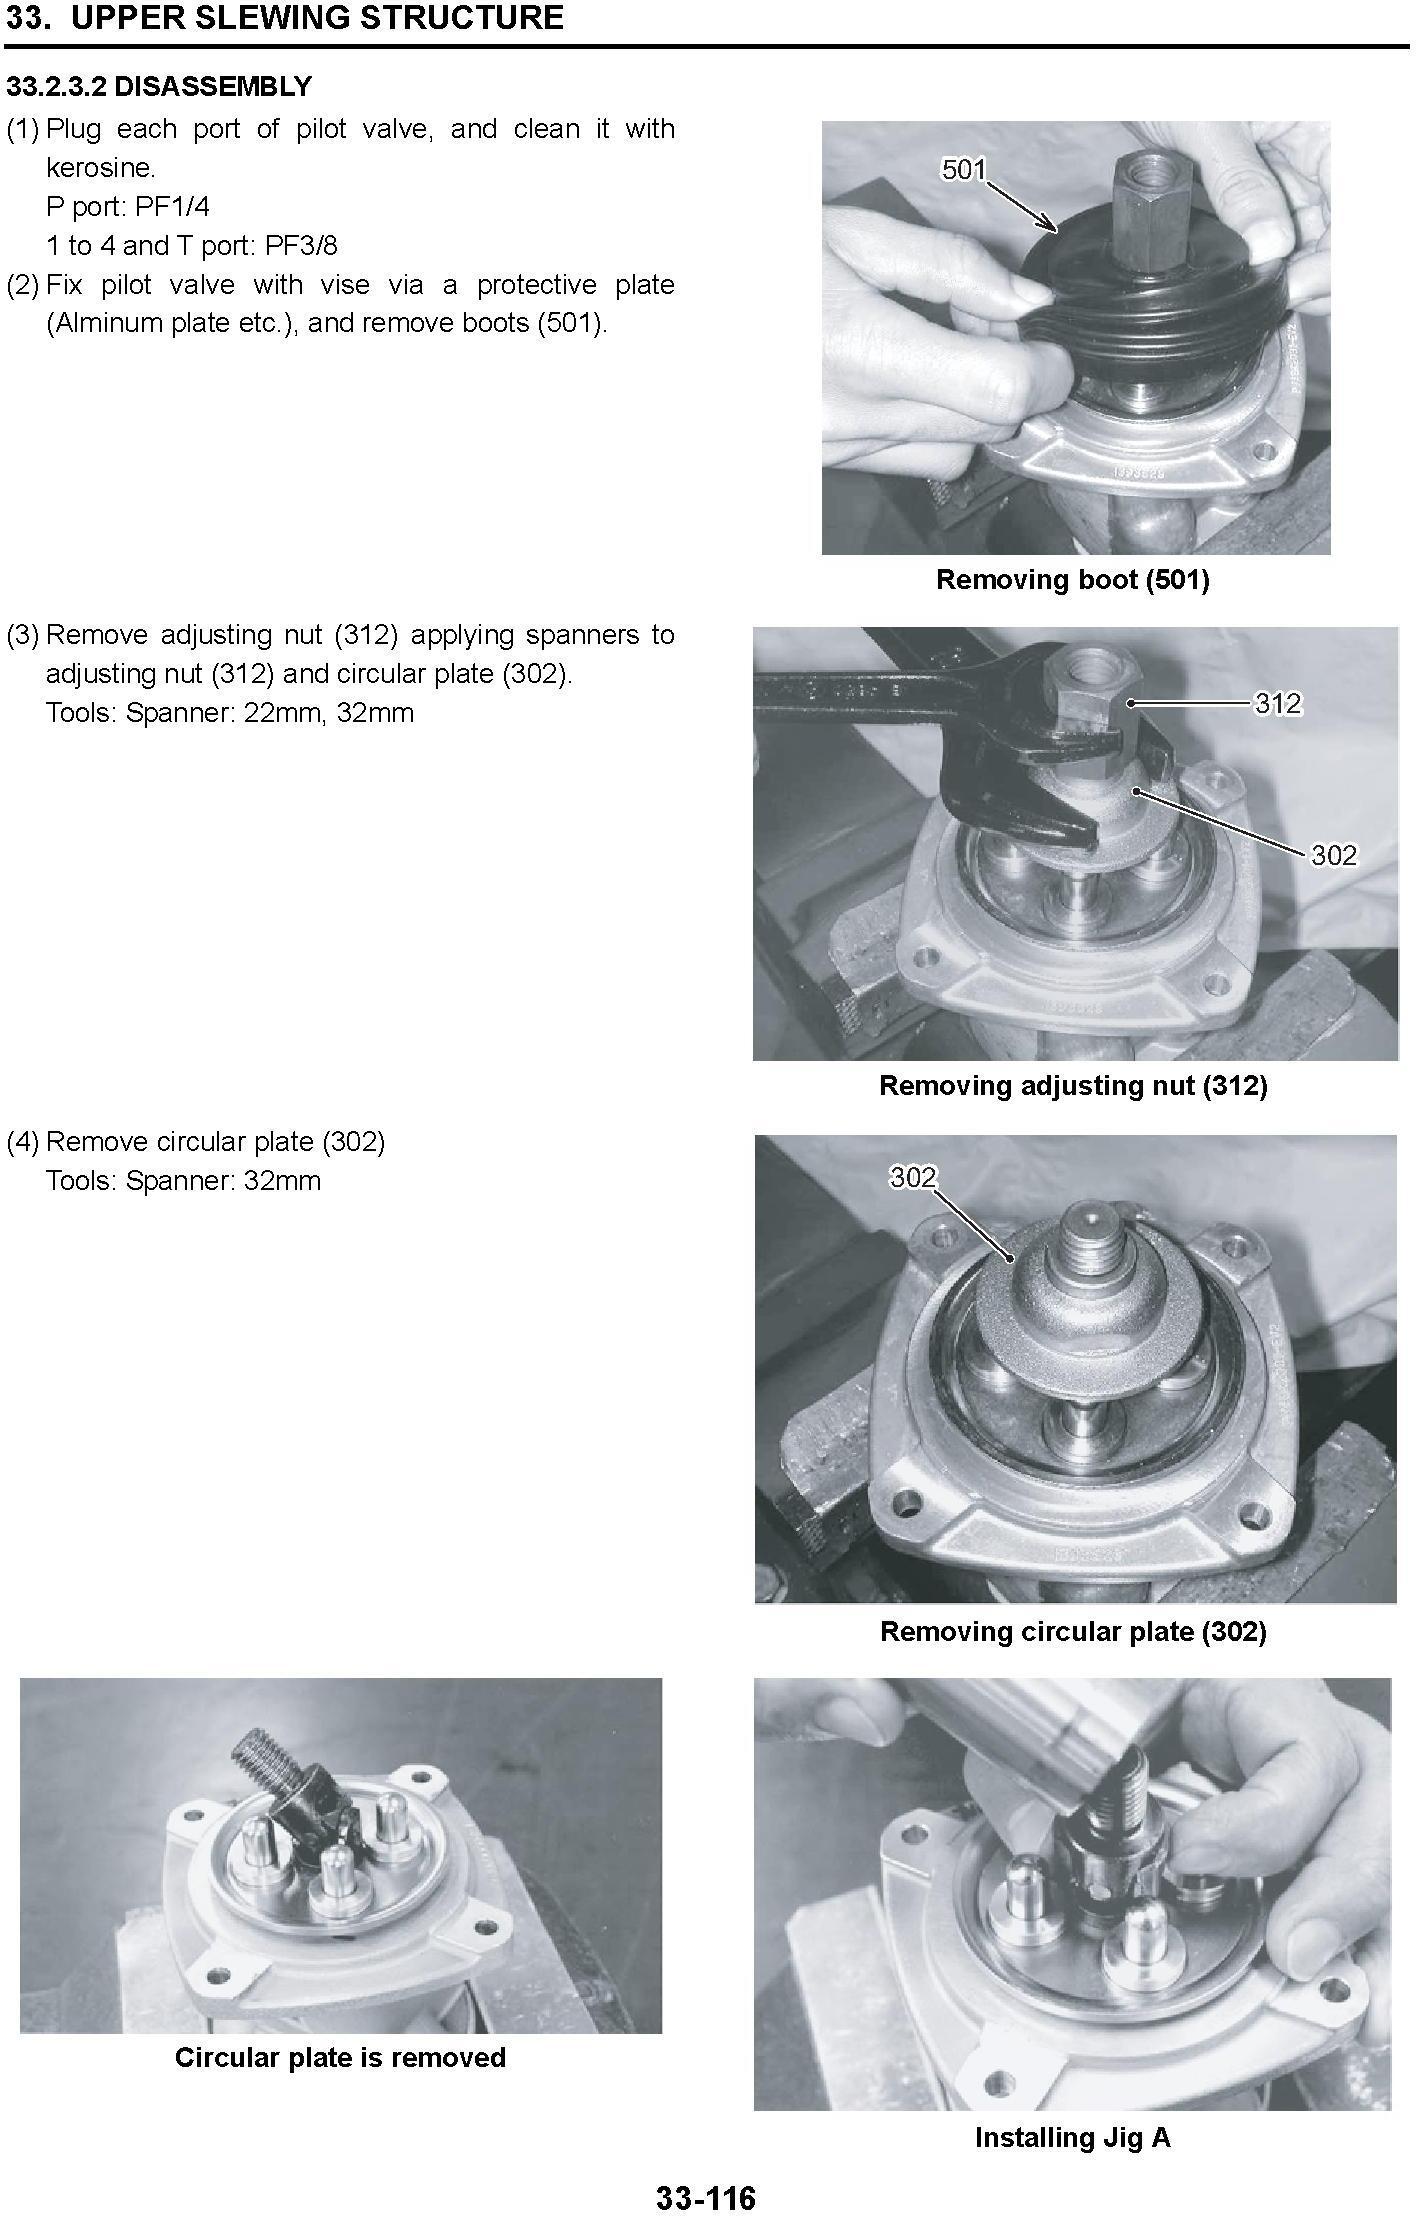 New Holland E140CSR Crawler Excavator Service Manual - 3